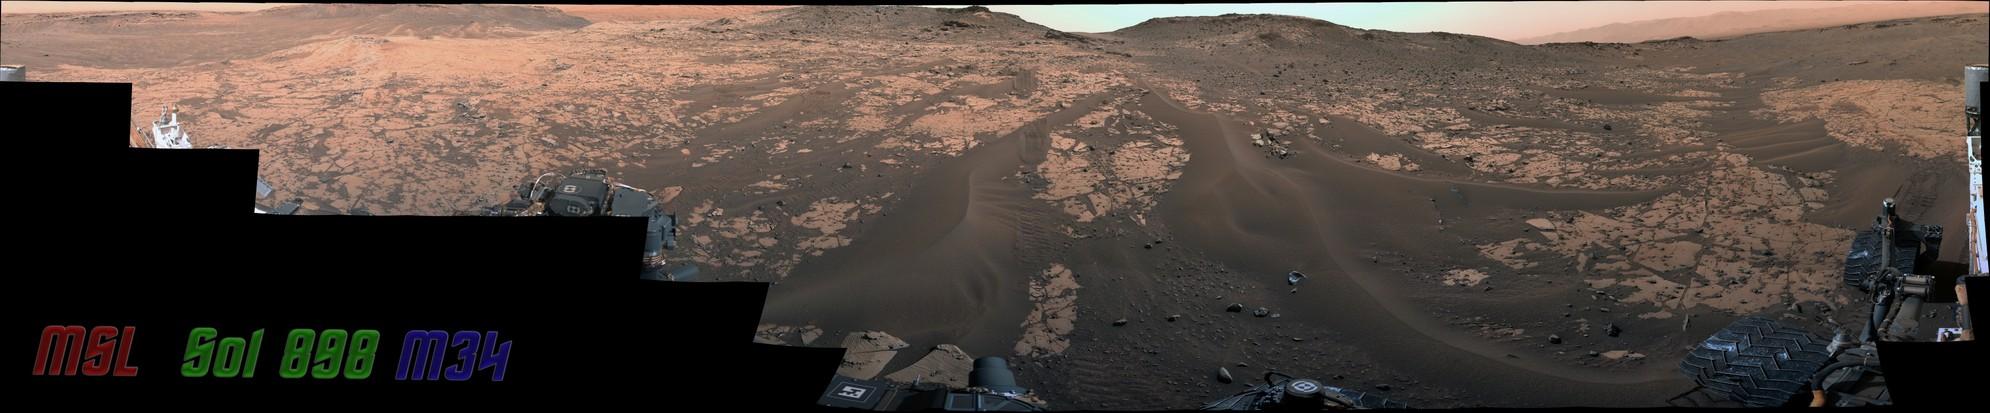 MSL Curiosity Rover - Sol 898 Left Mastcam Mosaic (126 Images) [PDS]